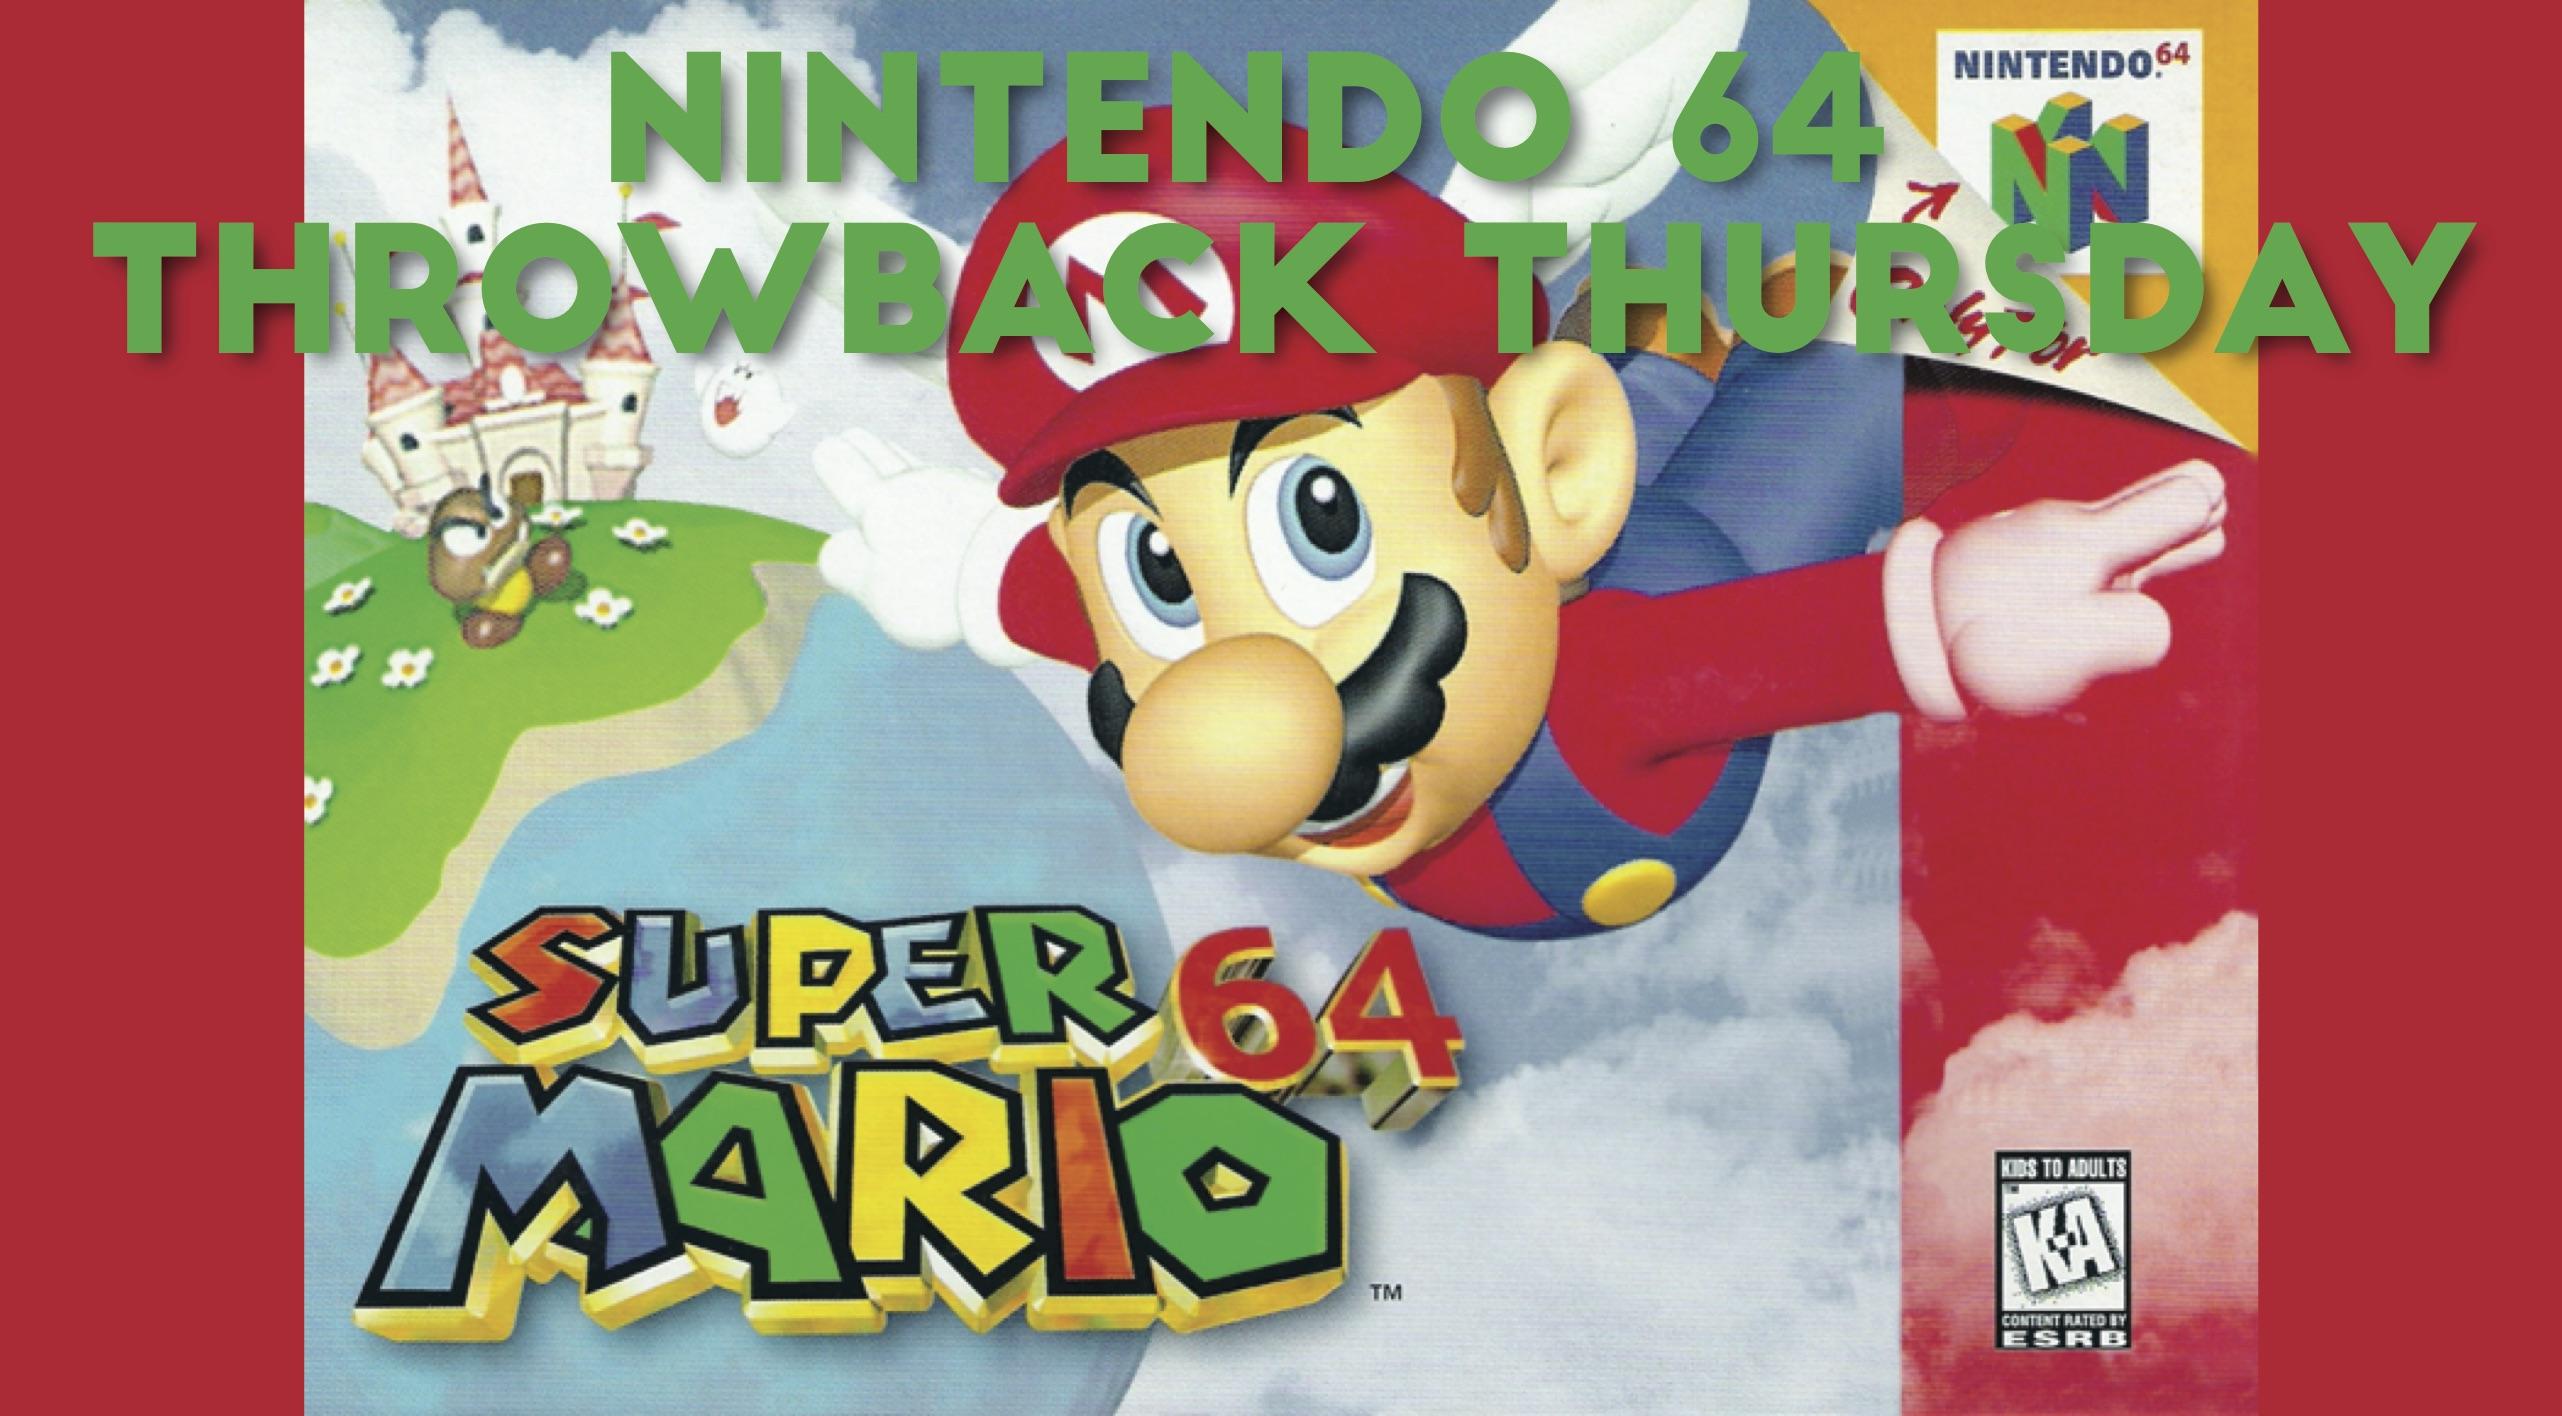 Nintendo 64 Throwback Thursday | Greenville University Papyrus